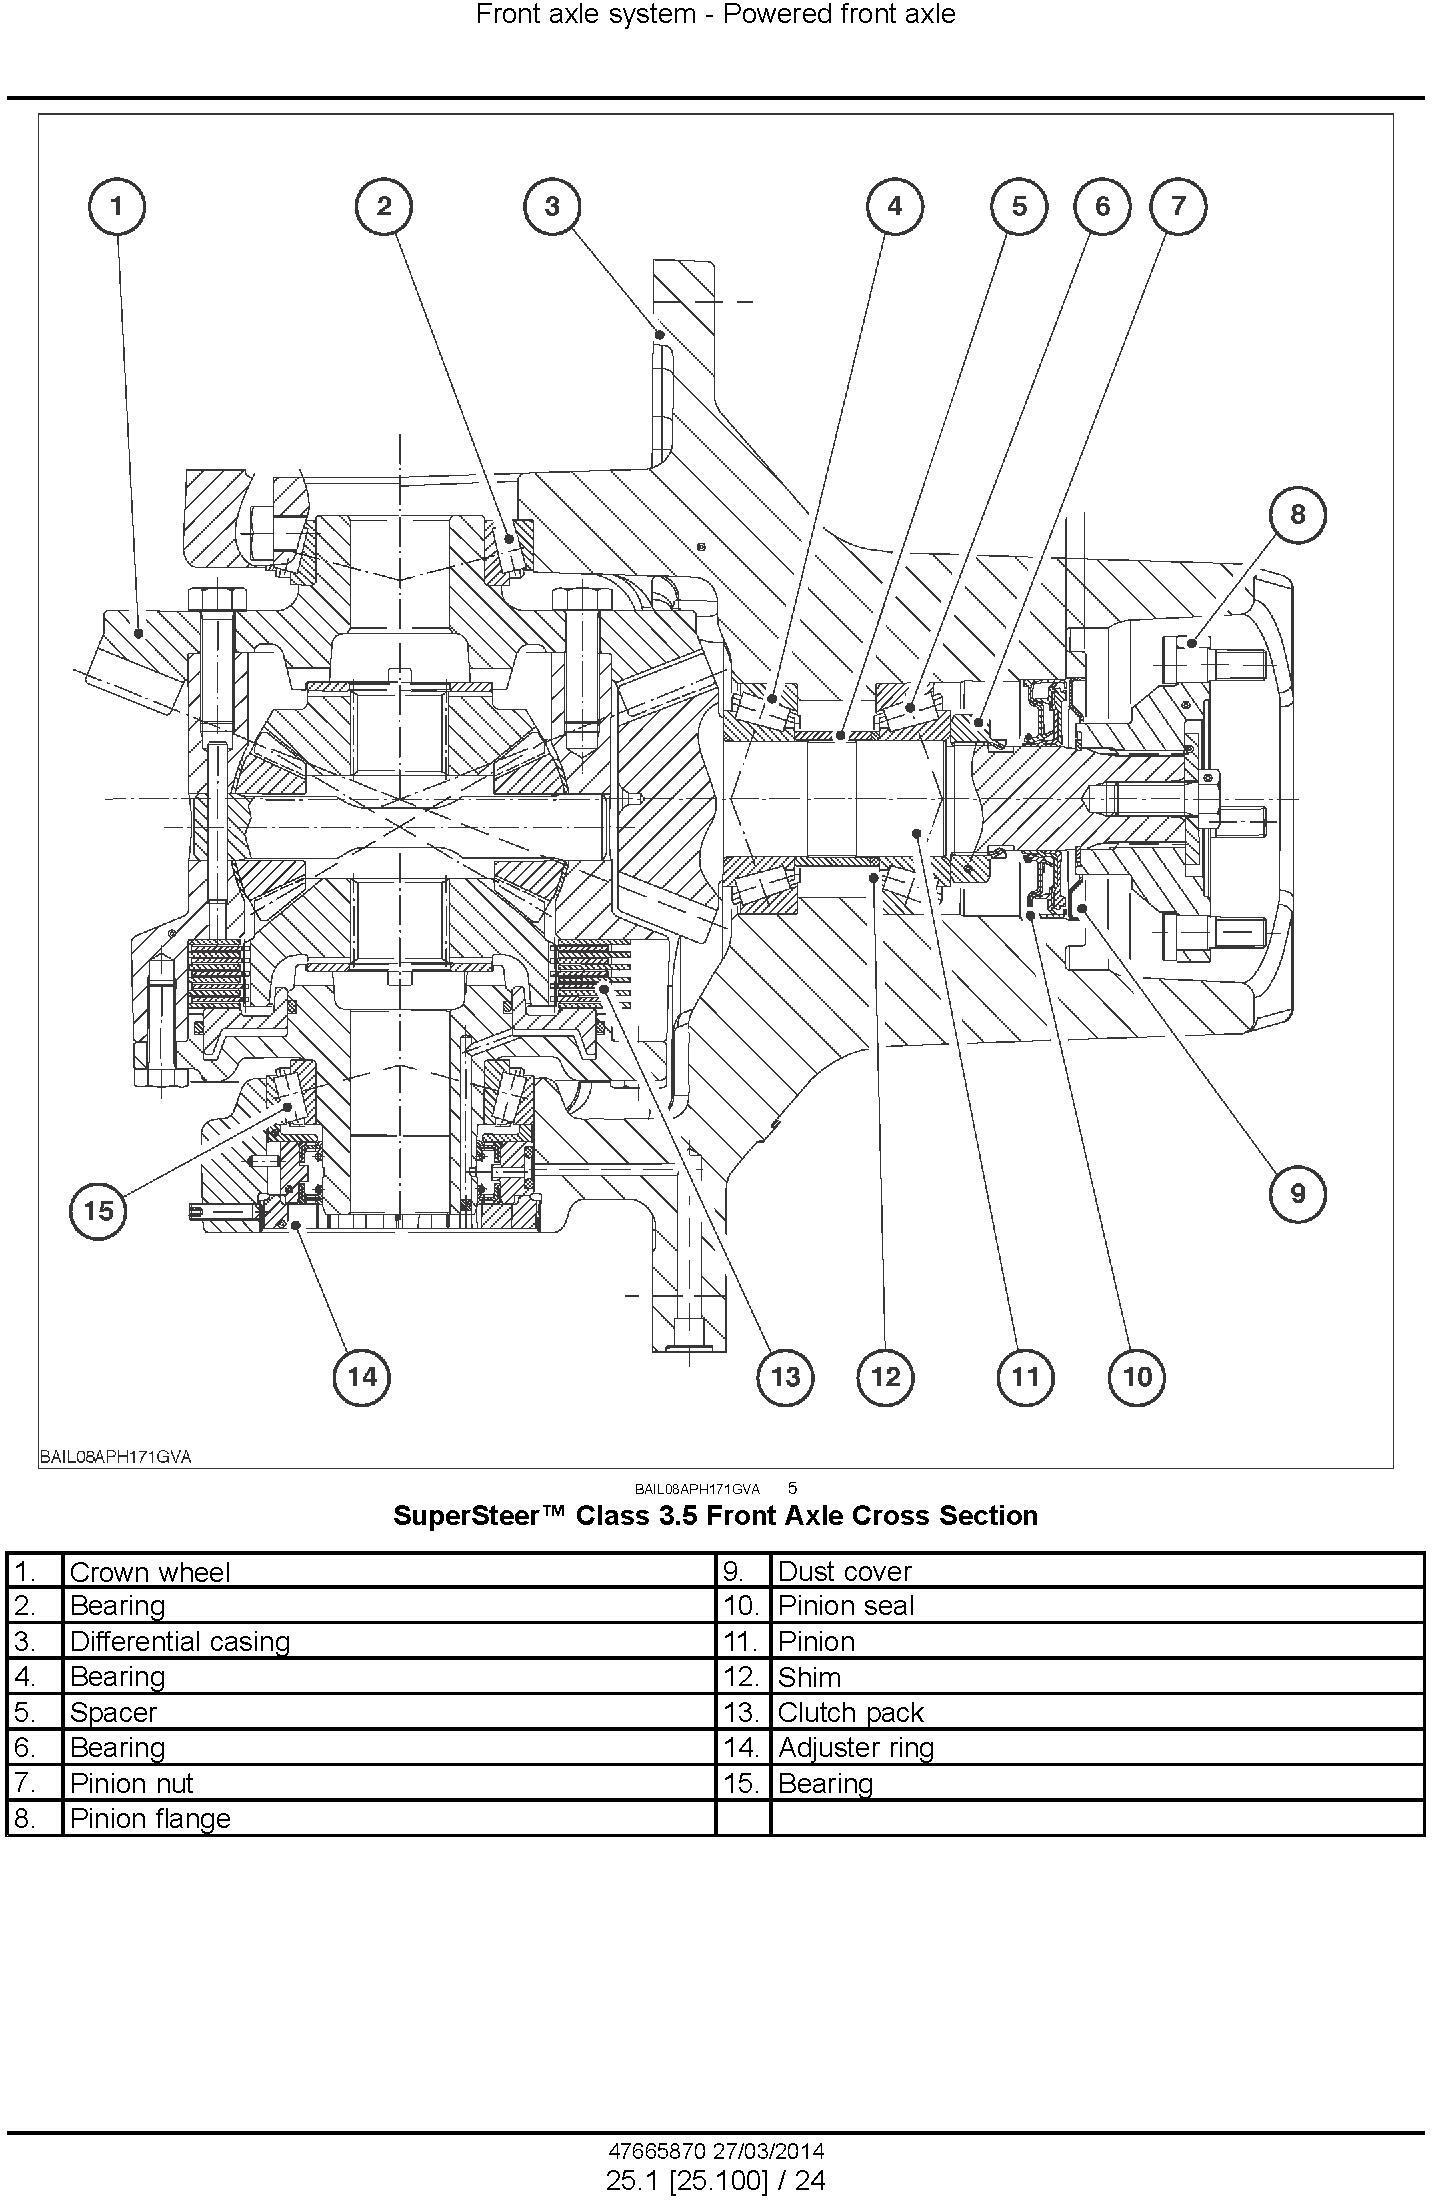 New Holland T6.120, T6.140, T6.150, T6.155, T6.160, T6.165. T6.175 Tier4A USA Tractor Service Manual - 3